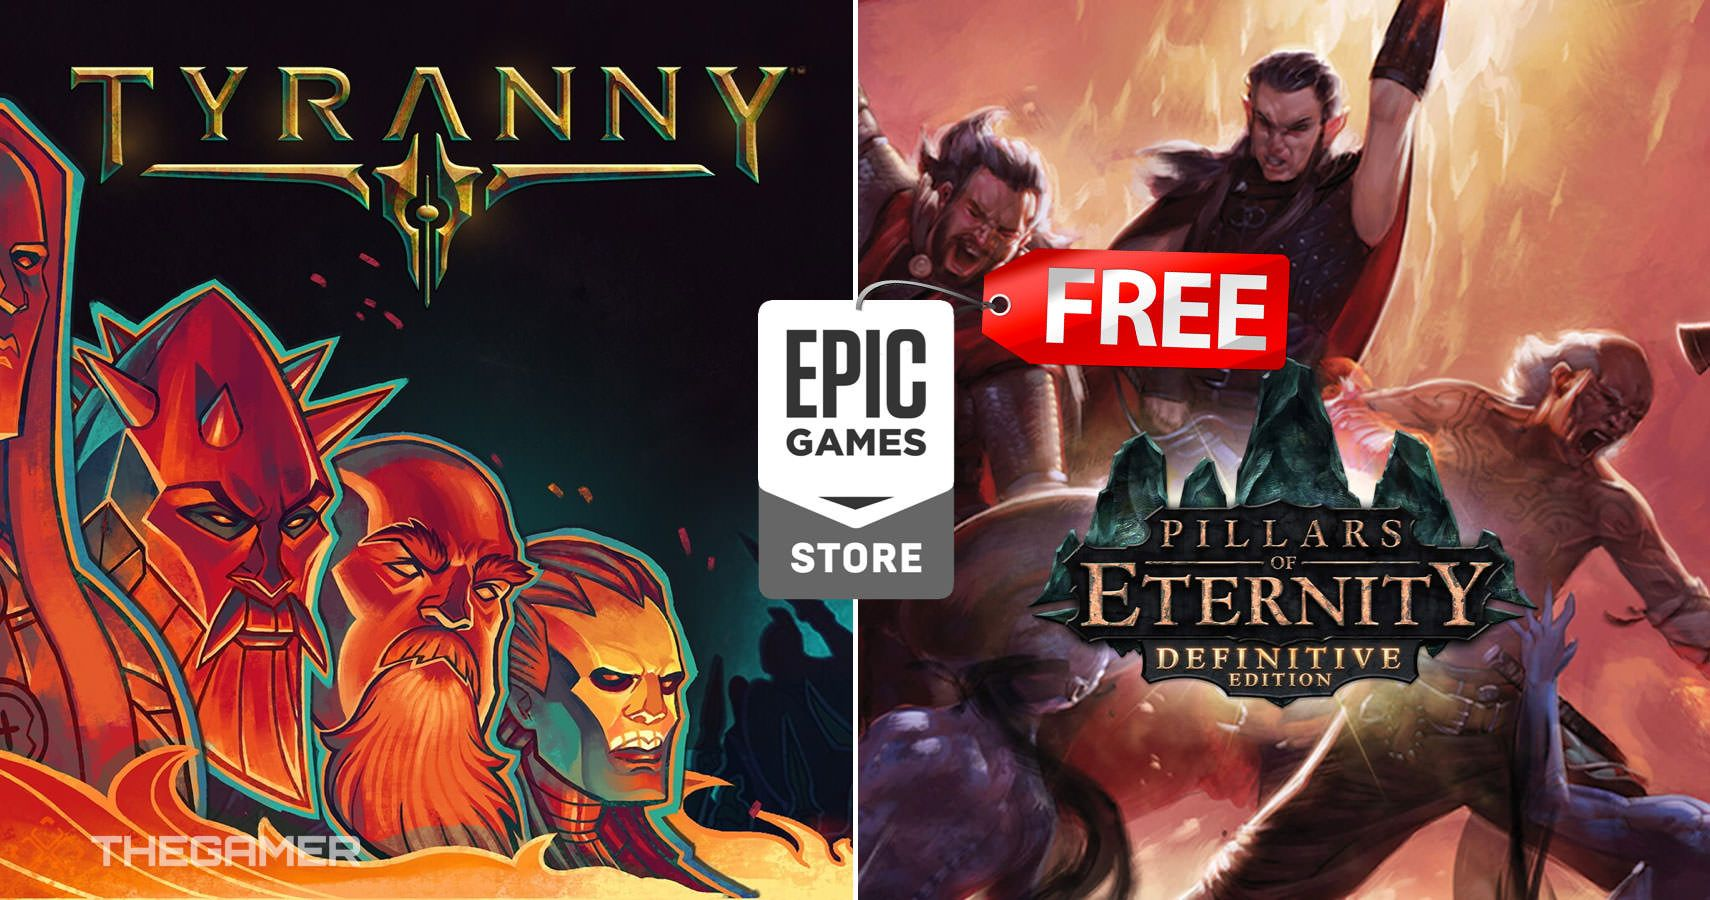 JEUX PC/Mac/Linux : bons plans du net et jeux gratuits - Page 24 Pillars-Of-Eternity-Definitive-Edition-And-Tyranny-Gold-Edition-Free-on-Epic-Games-Store